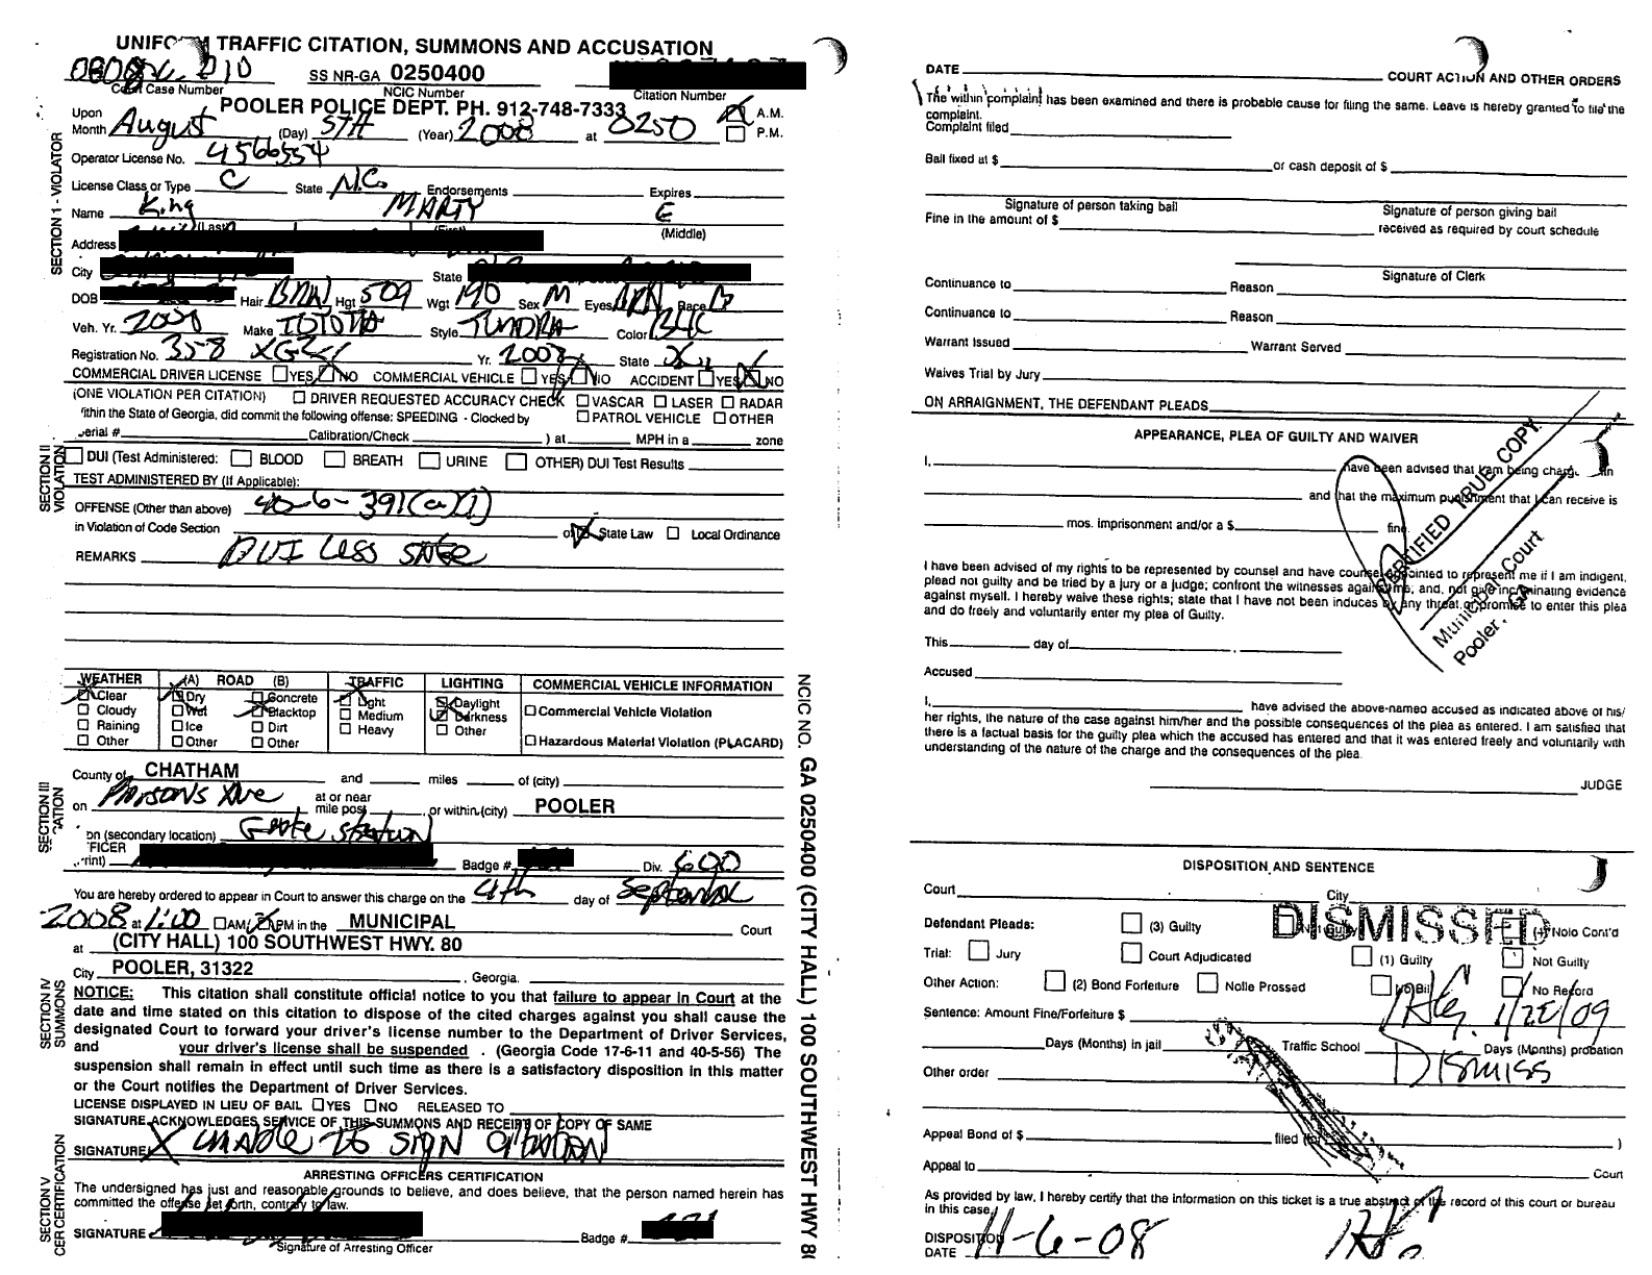 Bail Bondsman's DUI Dismissed